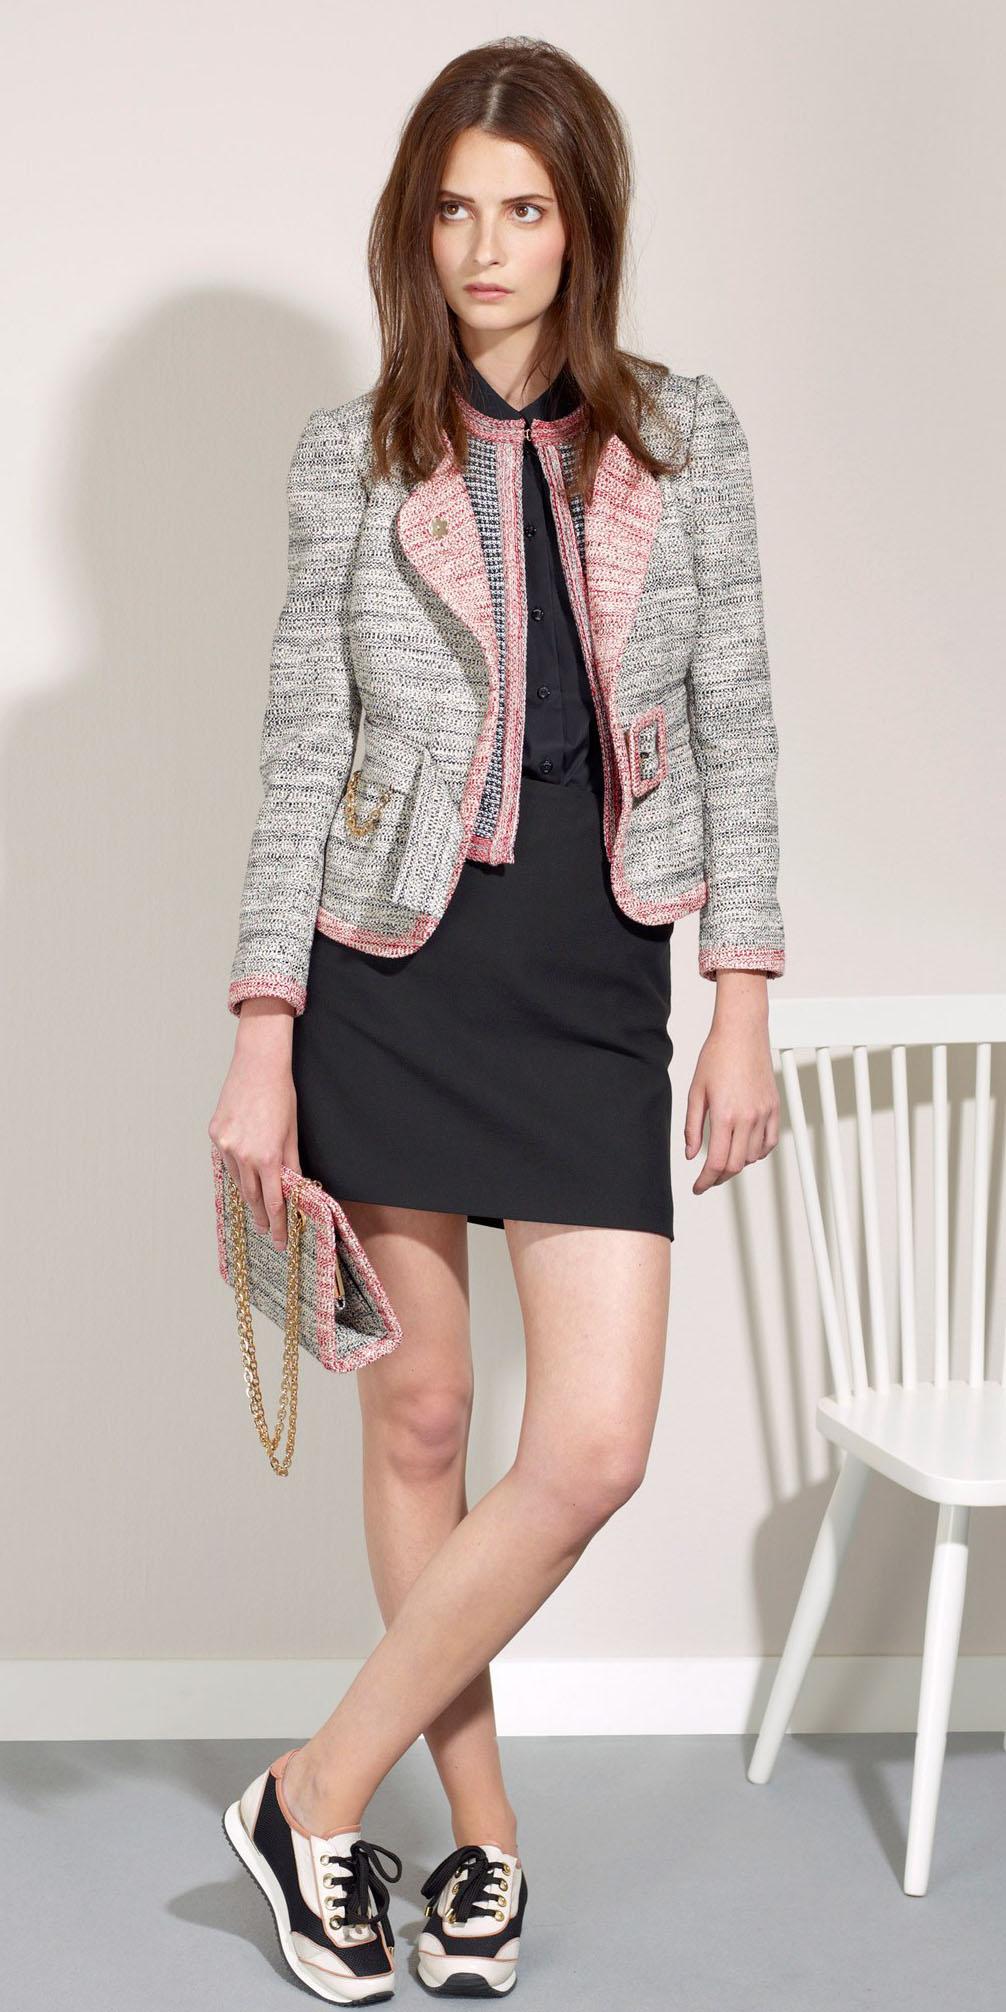 black-mini-skirt-black-collared-shirt-grayl-jacket-lady-hairr-white-shoe-sneakers-tweed-fall-winter-lunch.JPG